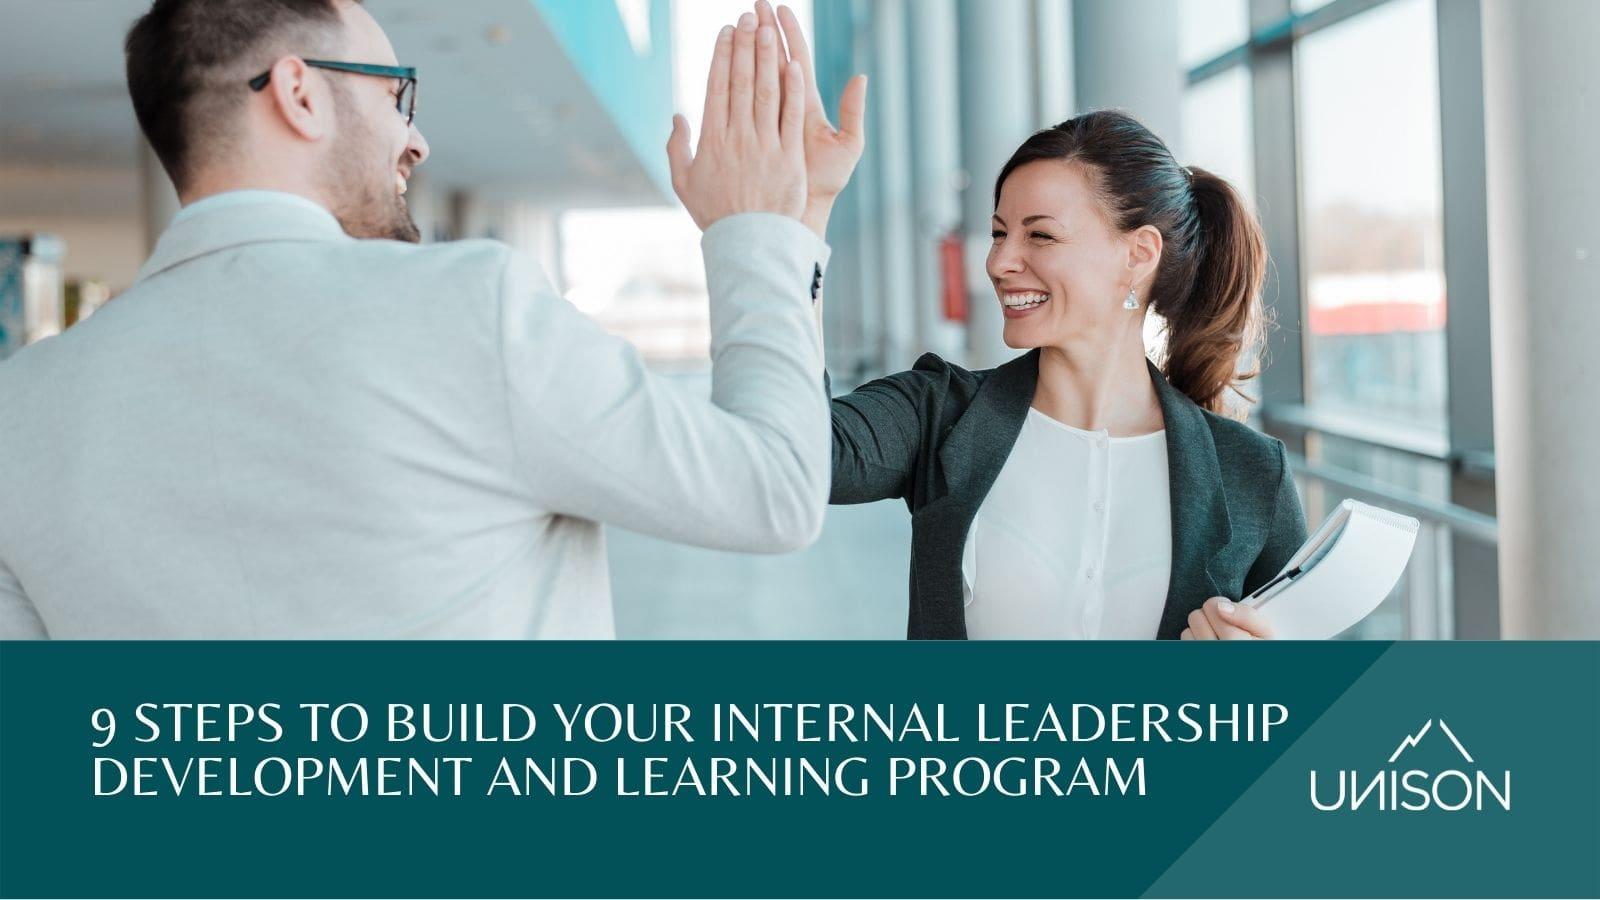 Internal leadership development